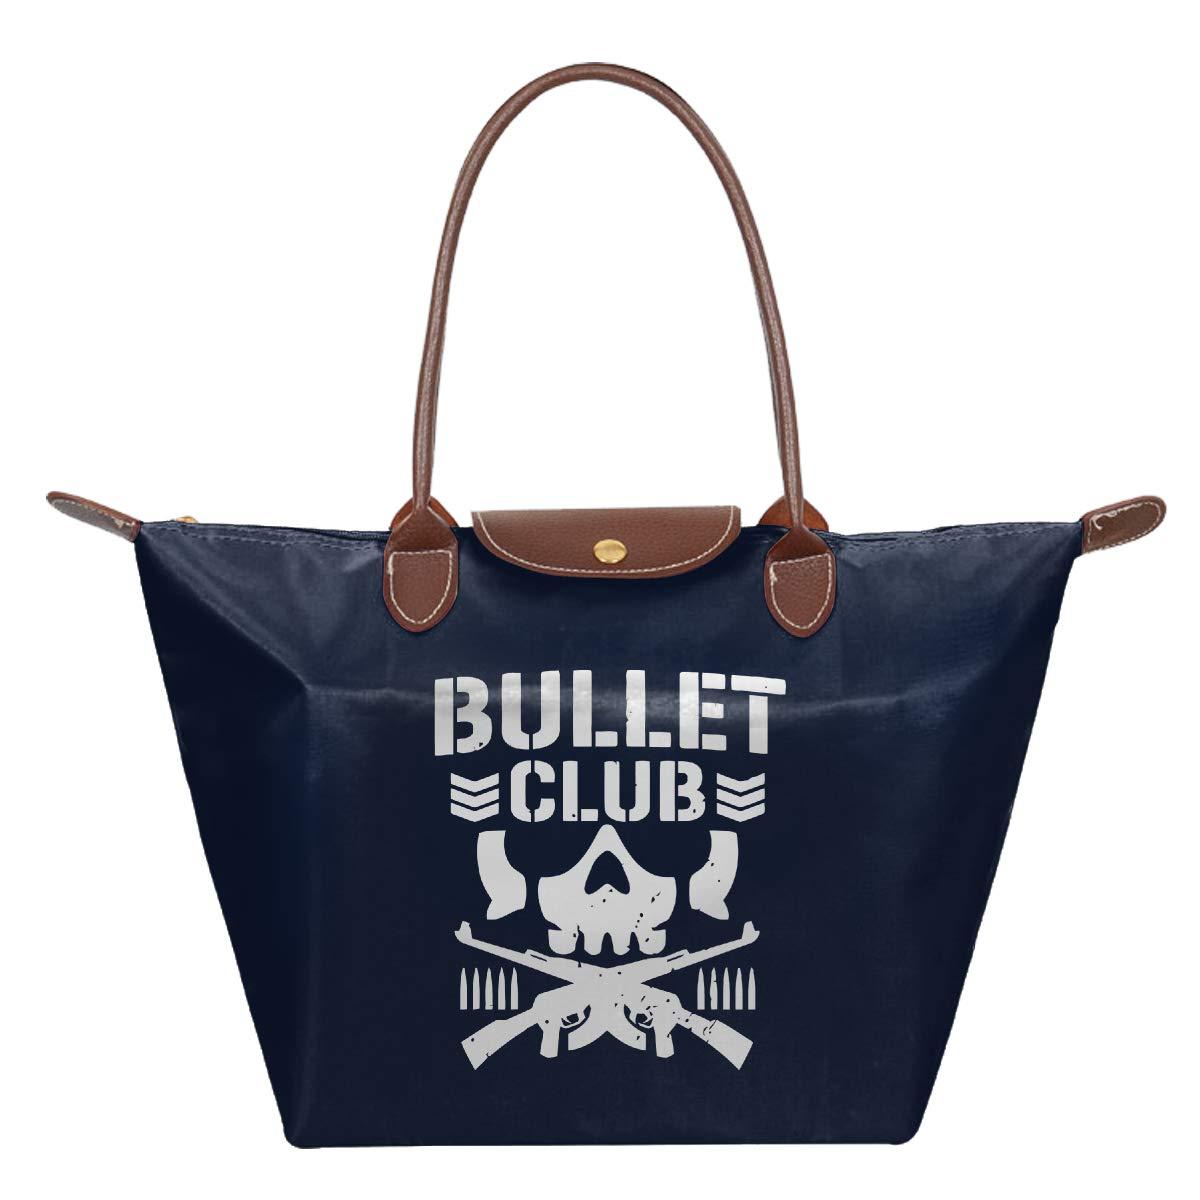 New Bullet Club UFC Fight Japan Wrestling Waterproof Leather Folded Messenger Nylon Bag Travel Tote Hopping Folding School Handbags